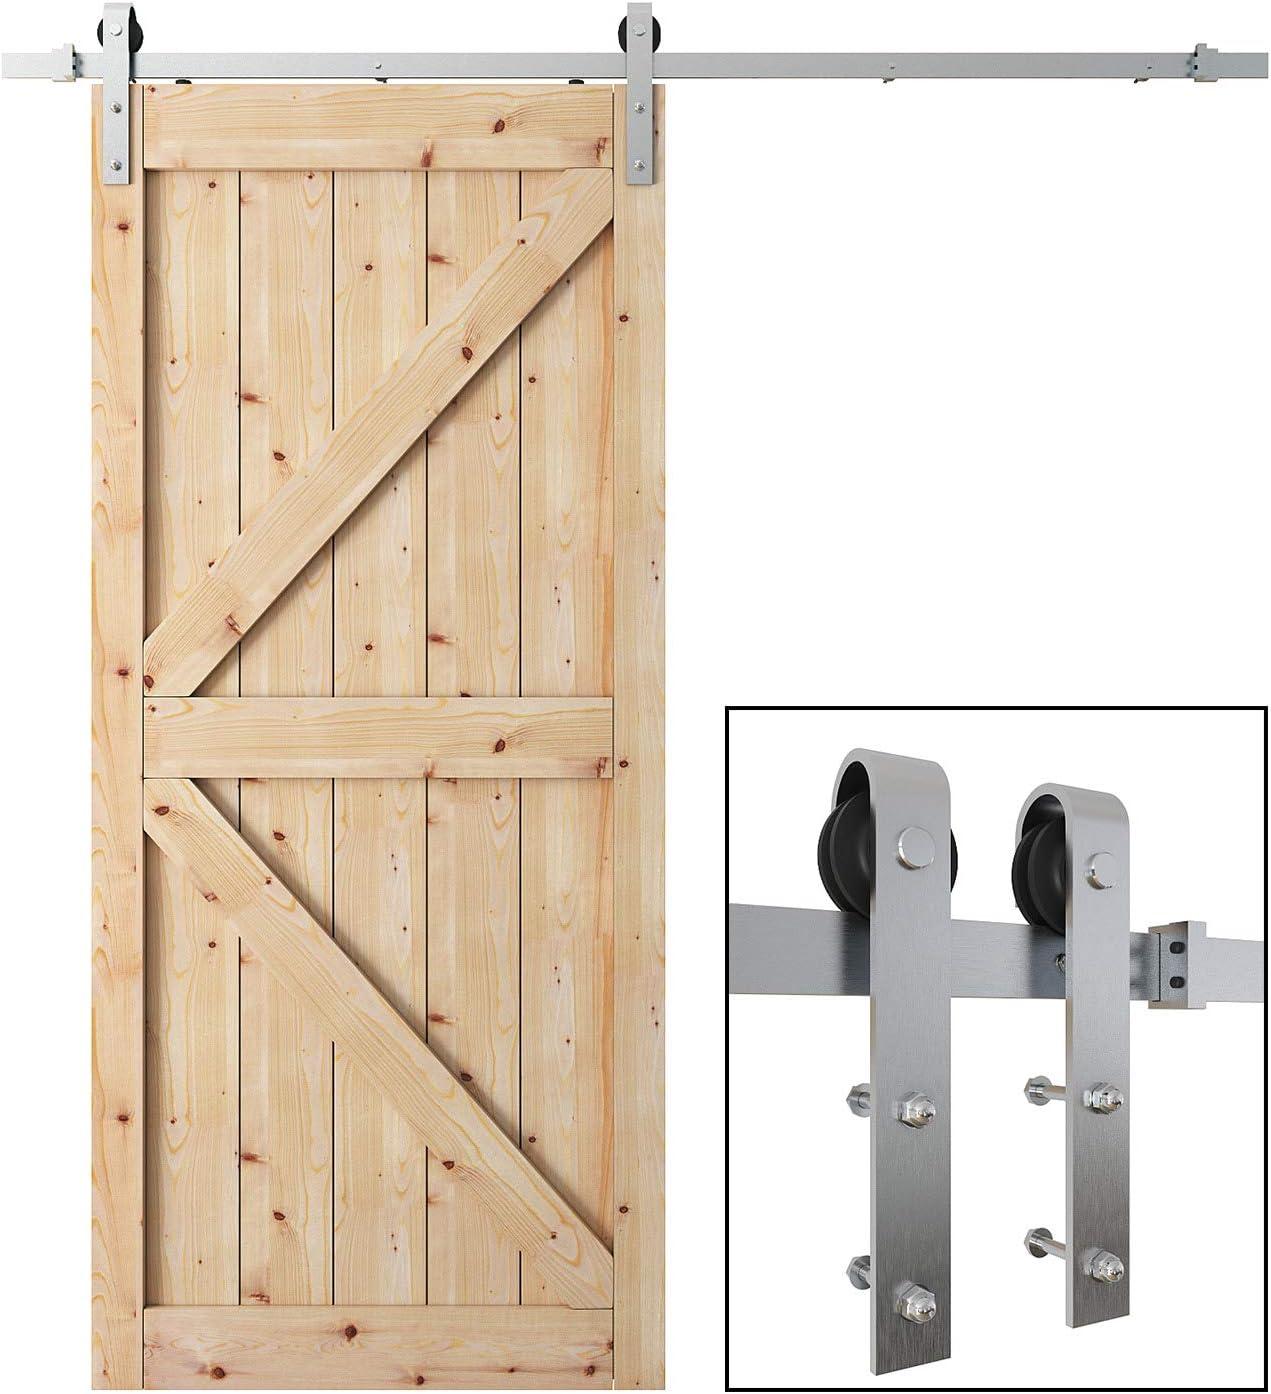 Stainless Steel Antique Sliding Barn Door Hardware Set Kit Wood Doors 6.6